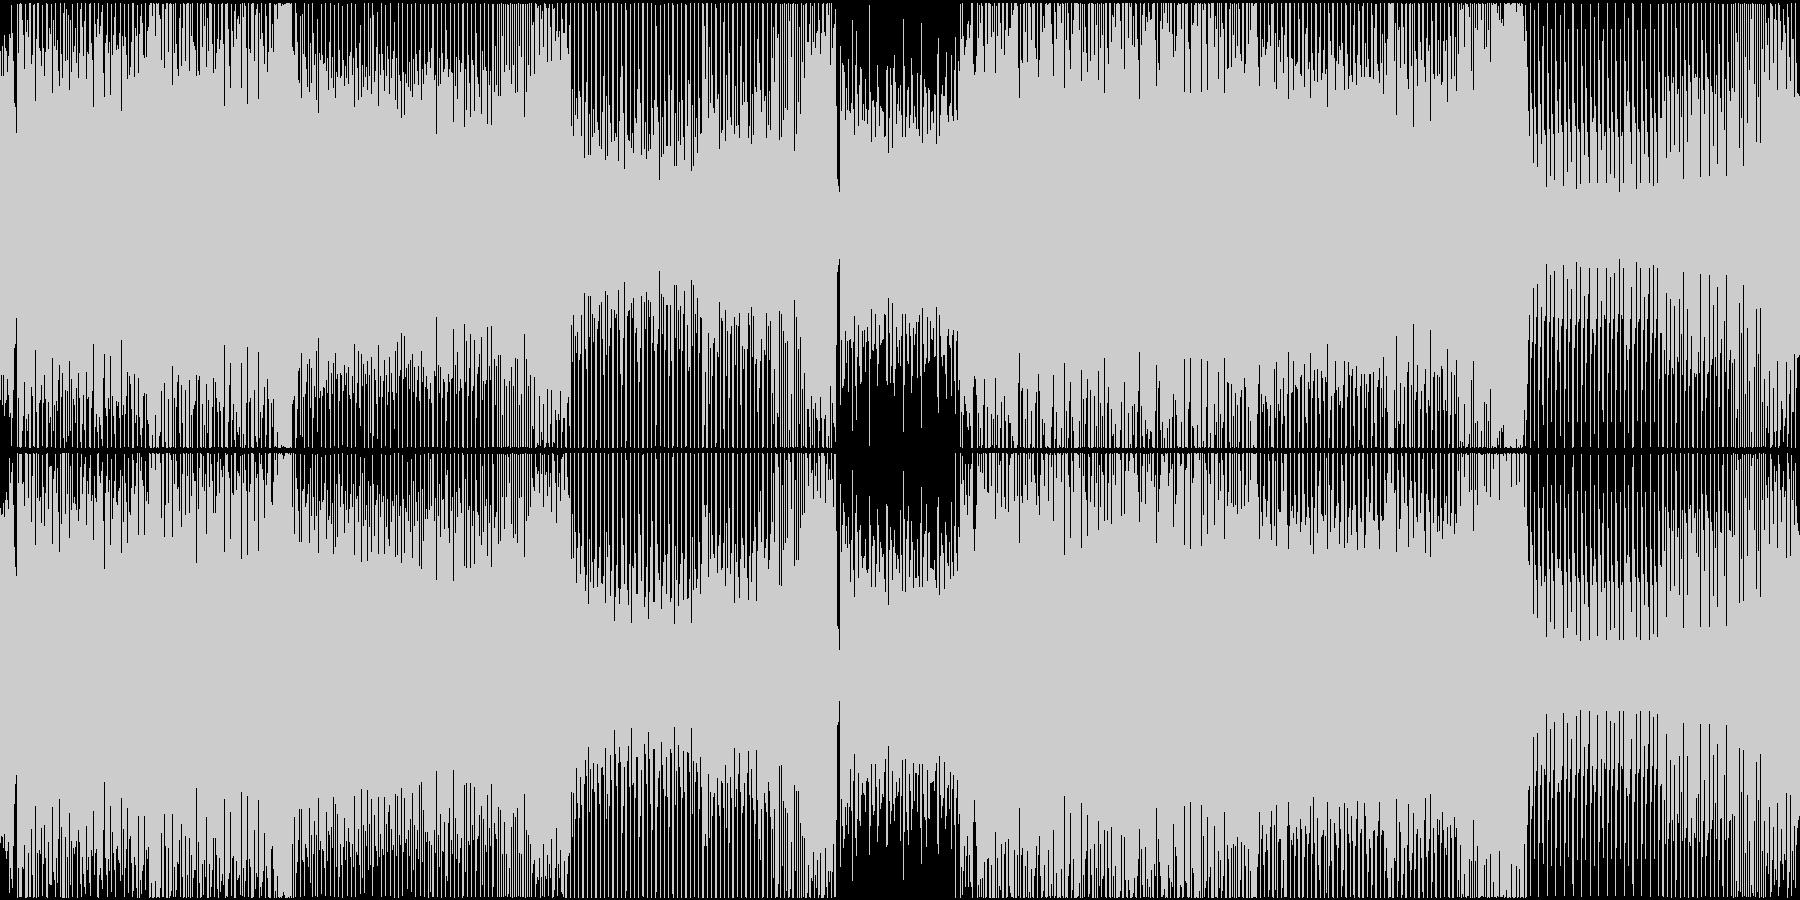 EDM トランス 明るい 楽しい BGMの未再生の波形